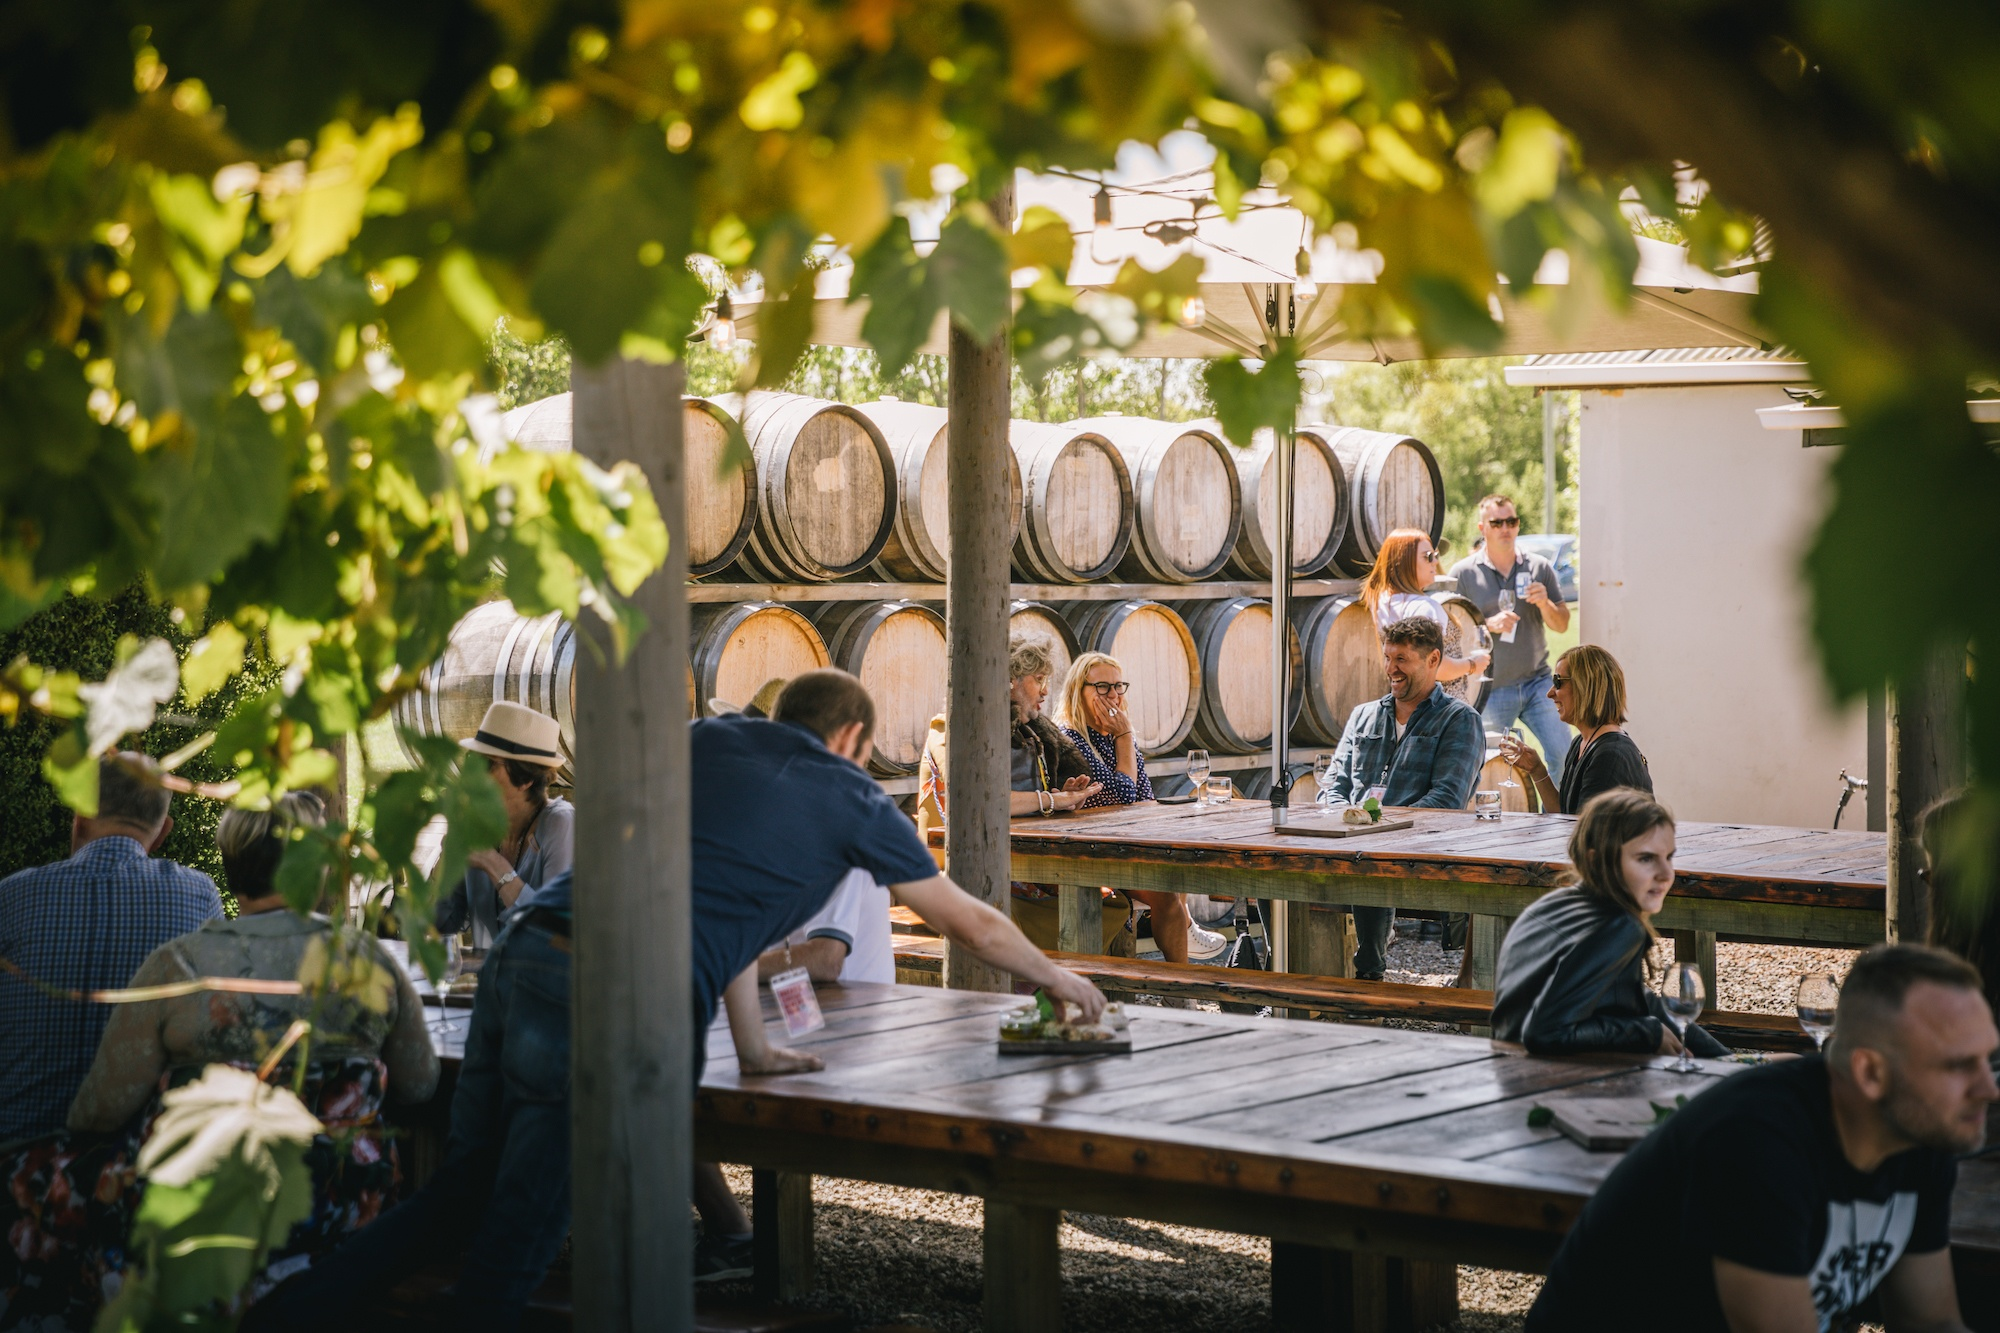 виноградники северного Кентербери